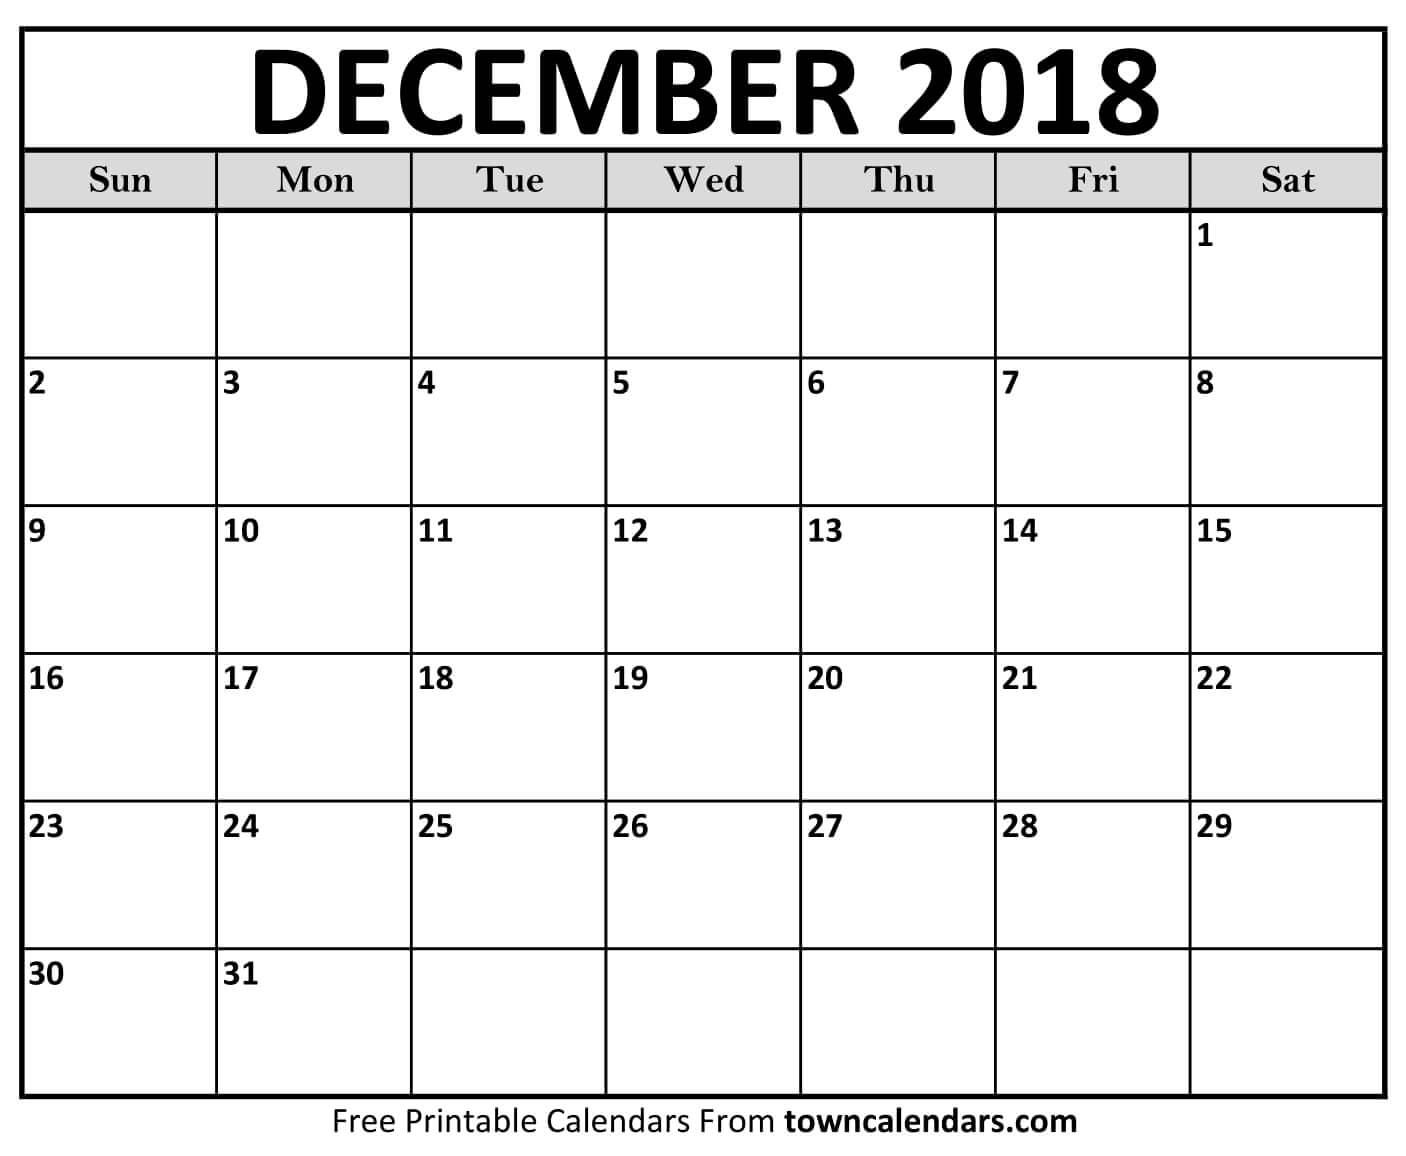 Monthly Calendar December 2018 Template Free Download throughout December Monthly Calendar Template